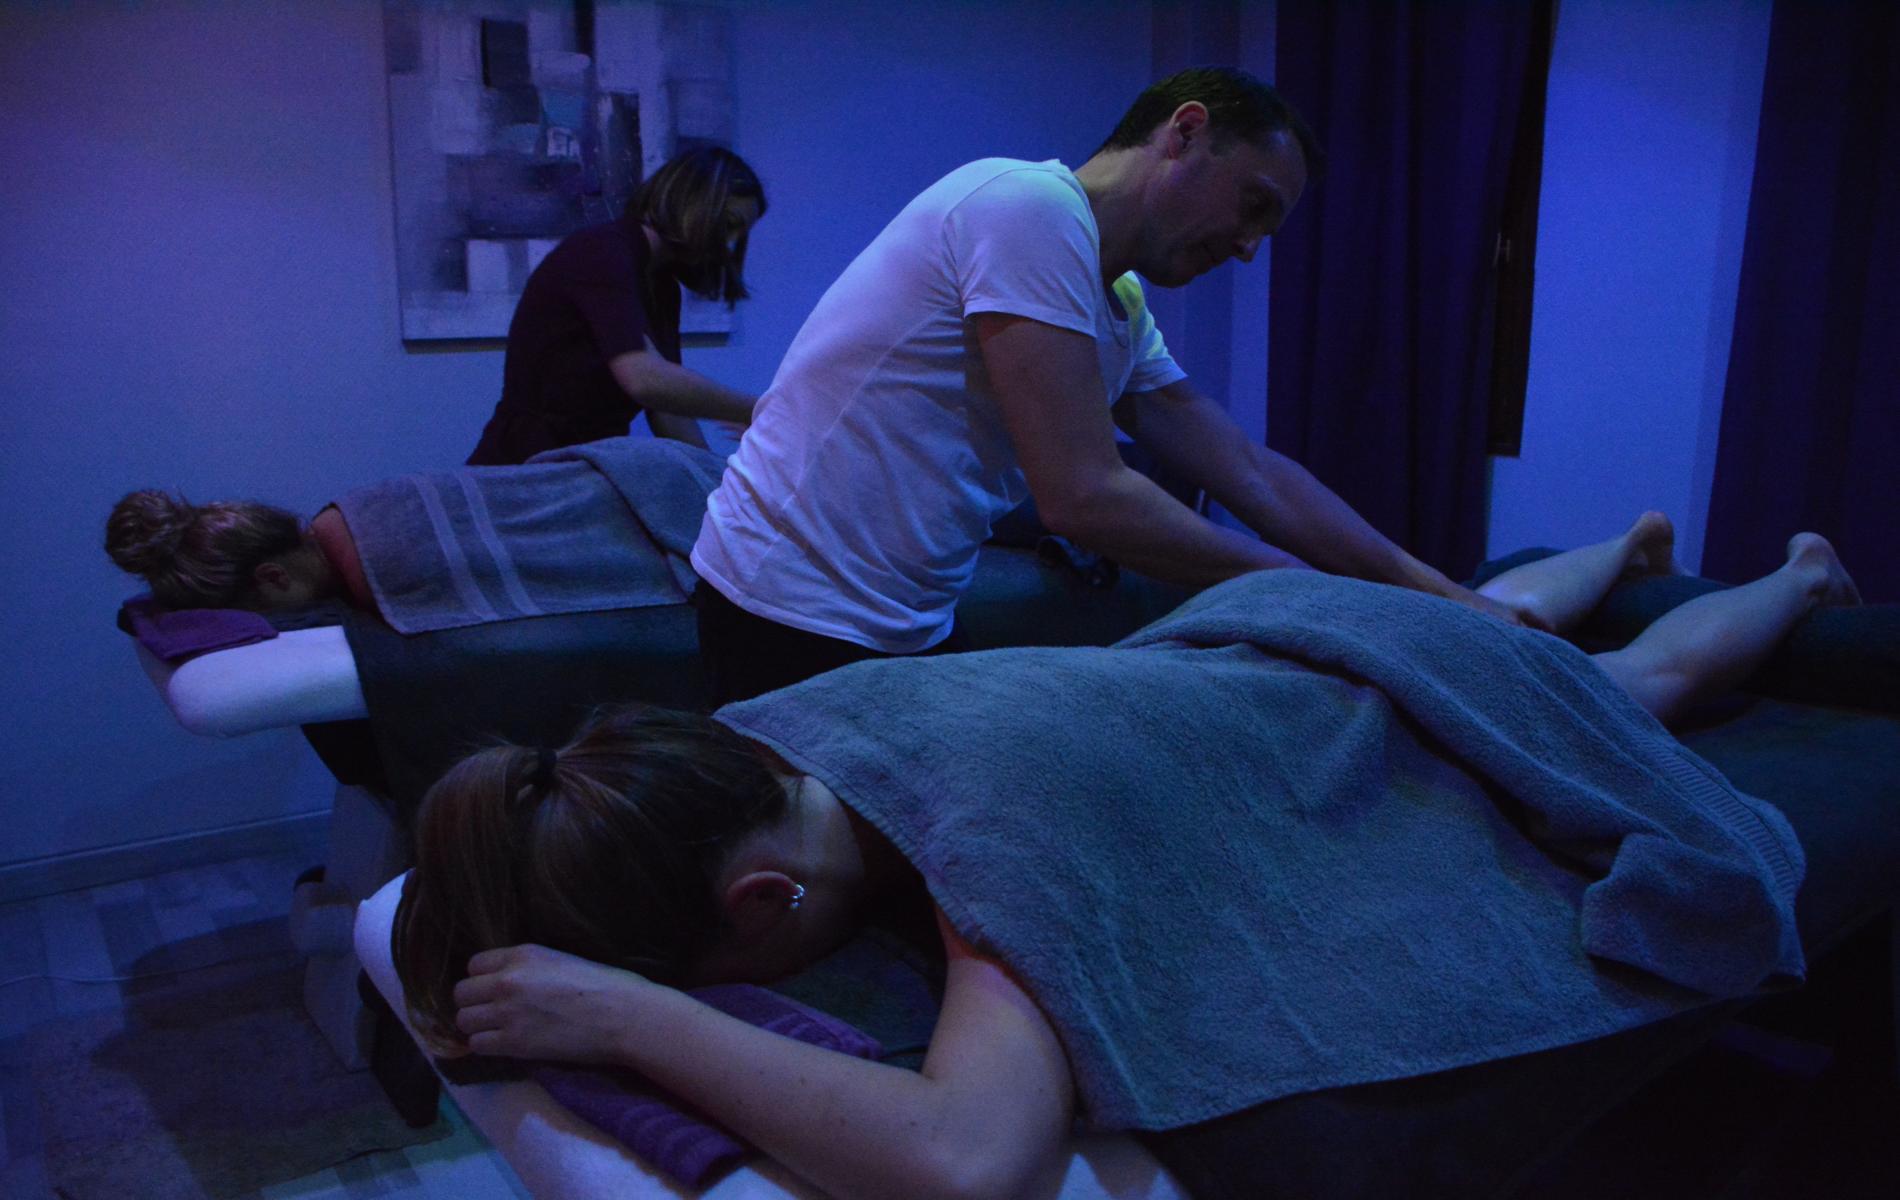 Massage intuitif, soin et massage